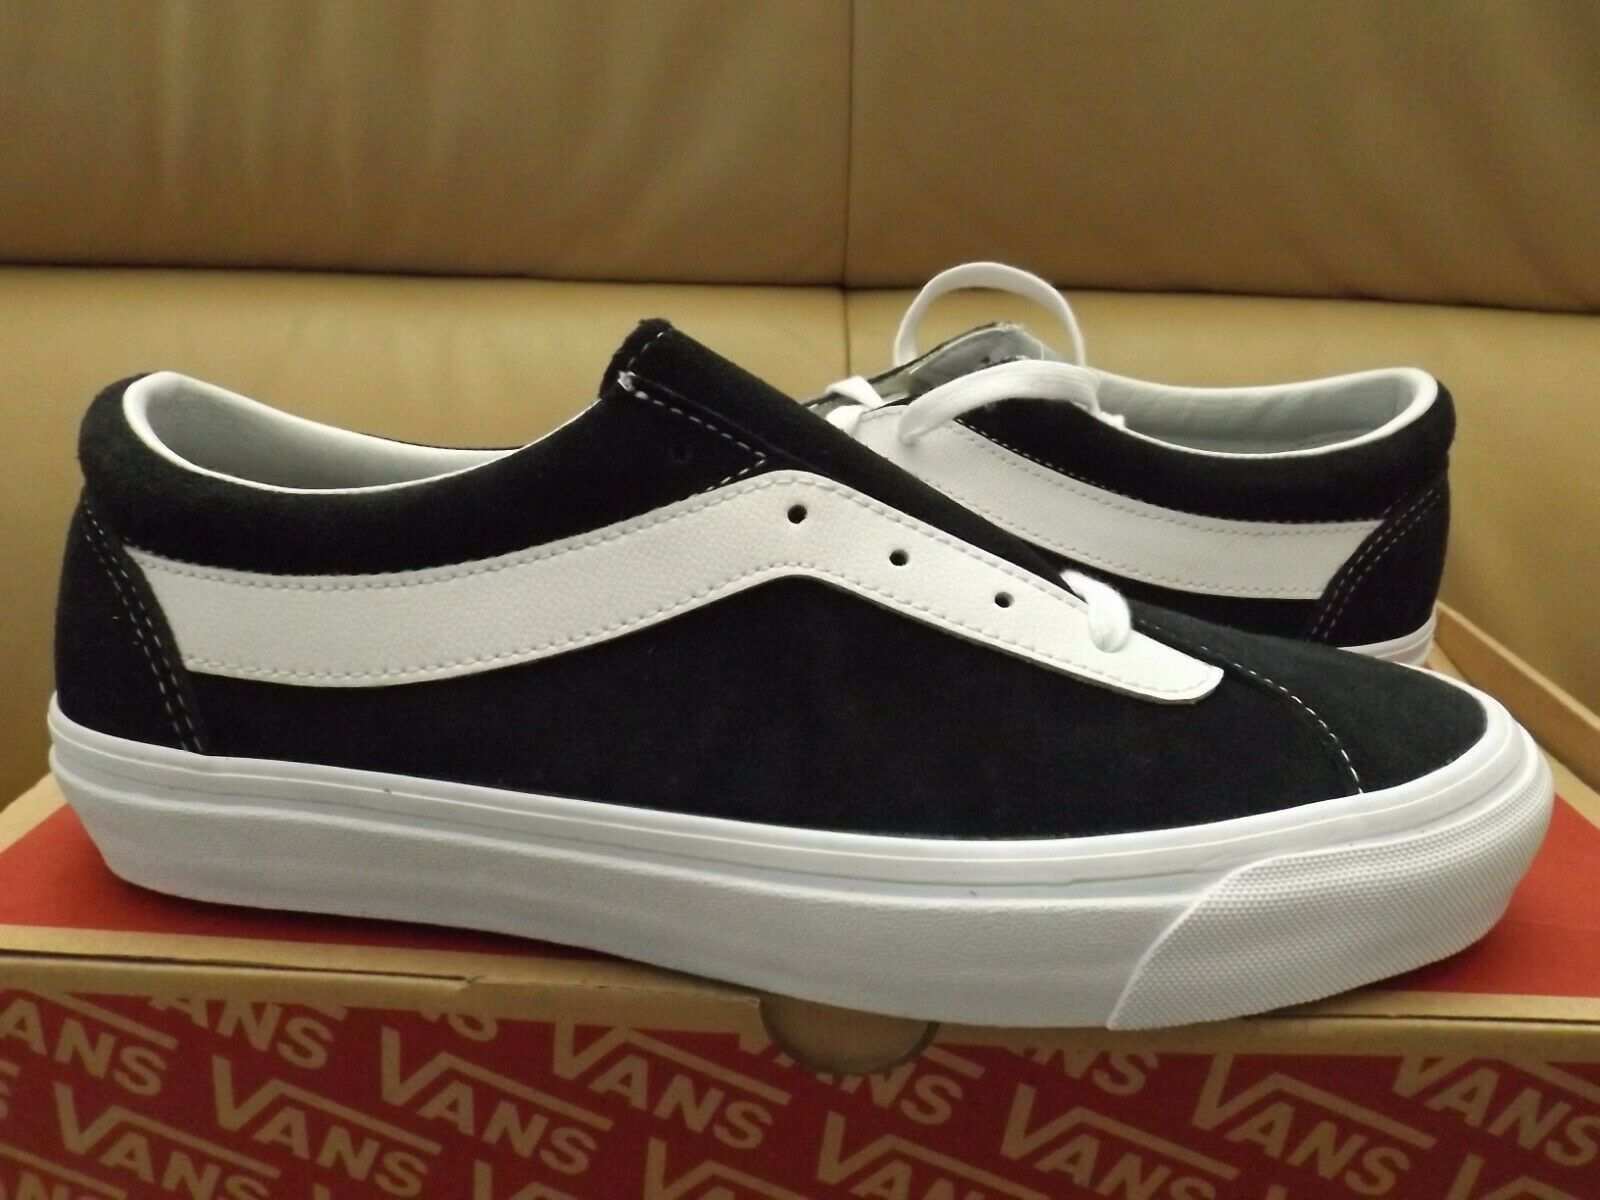 new design of vans shoes